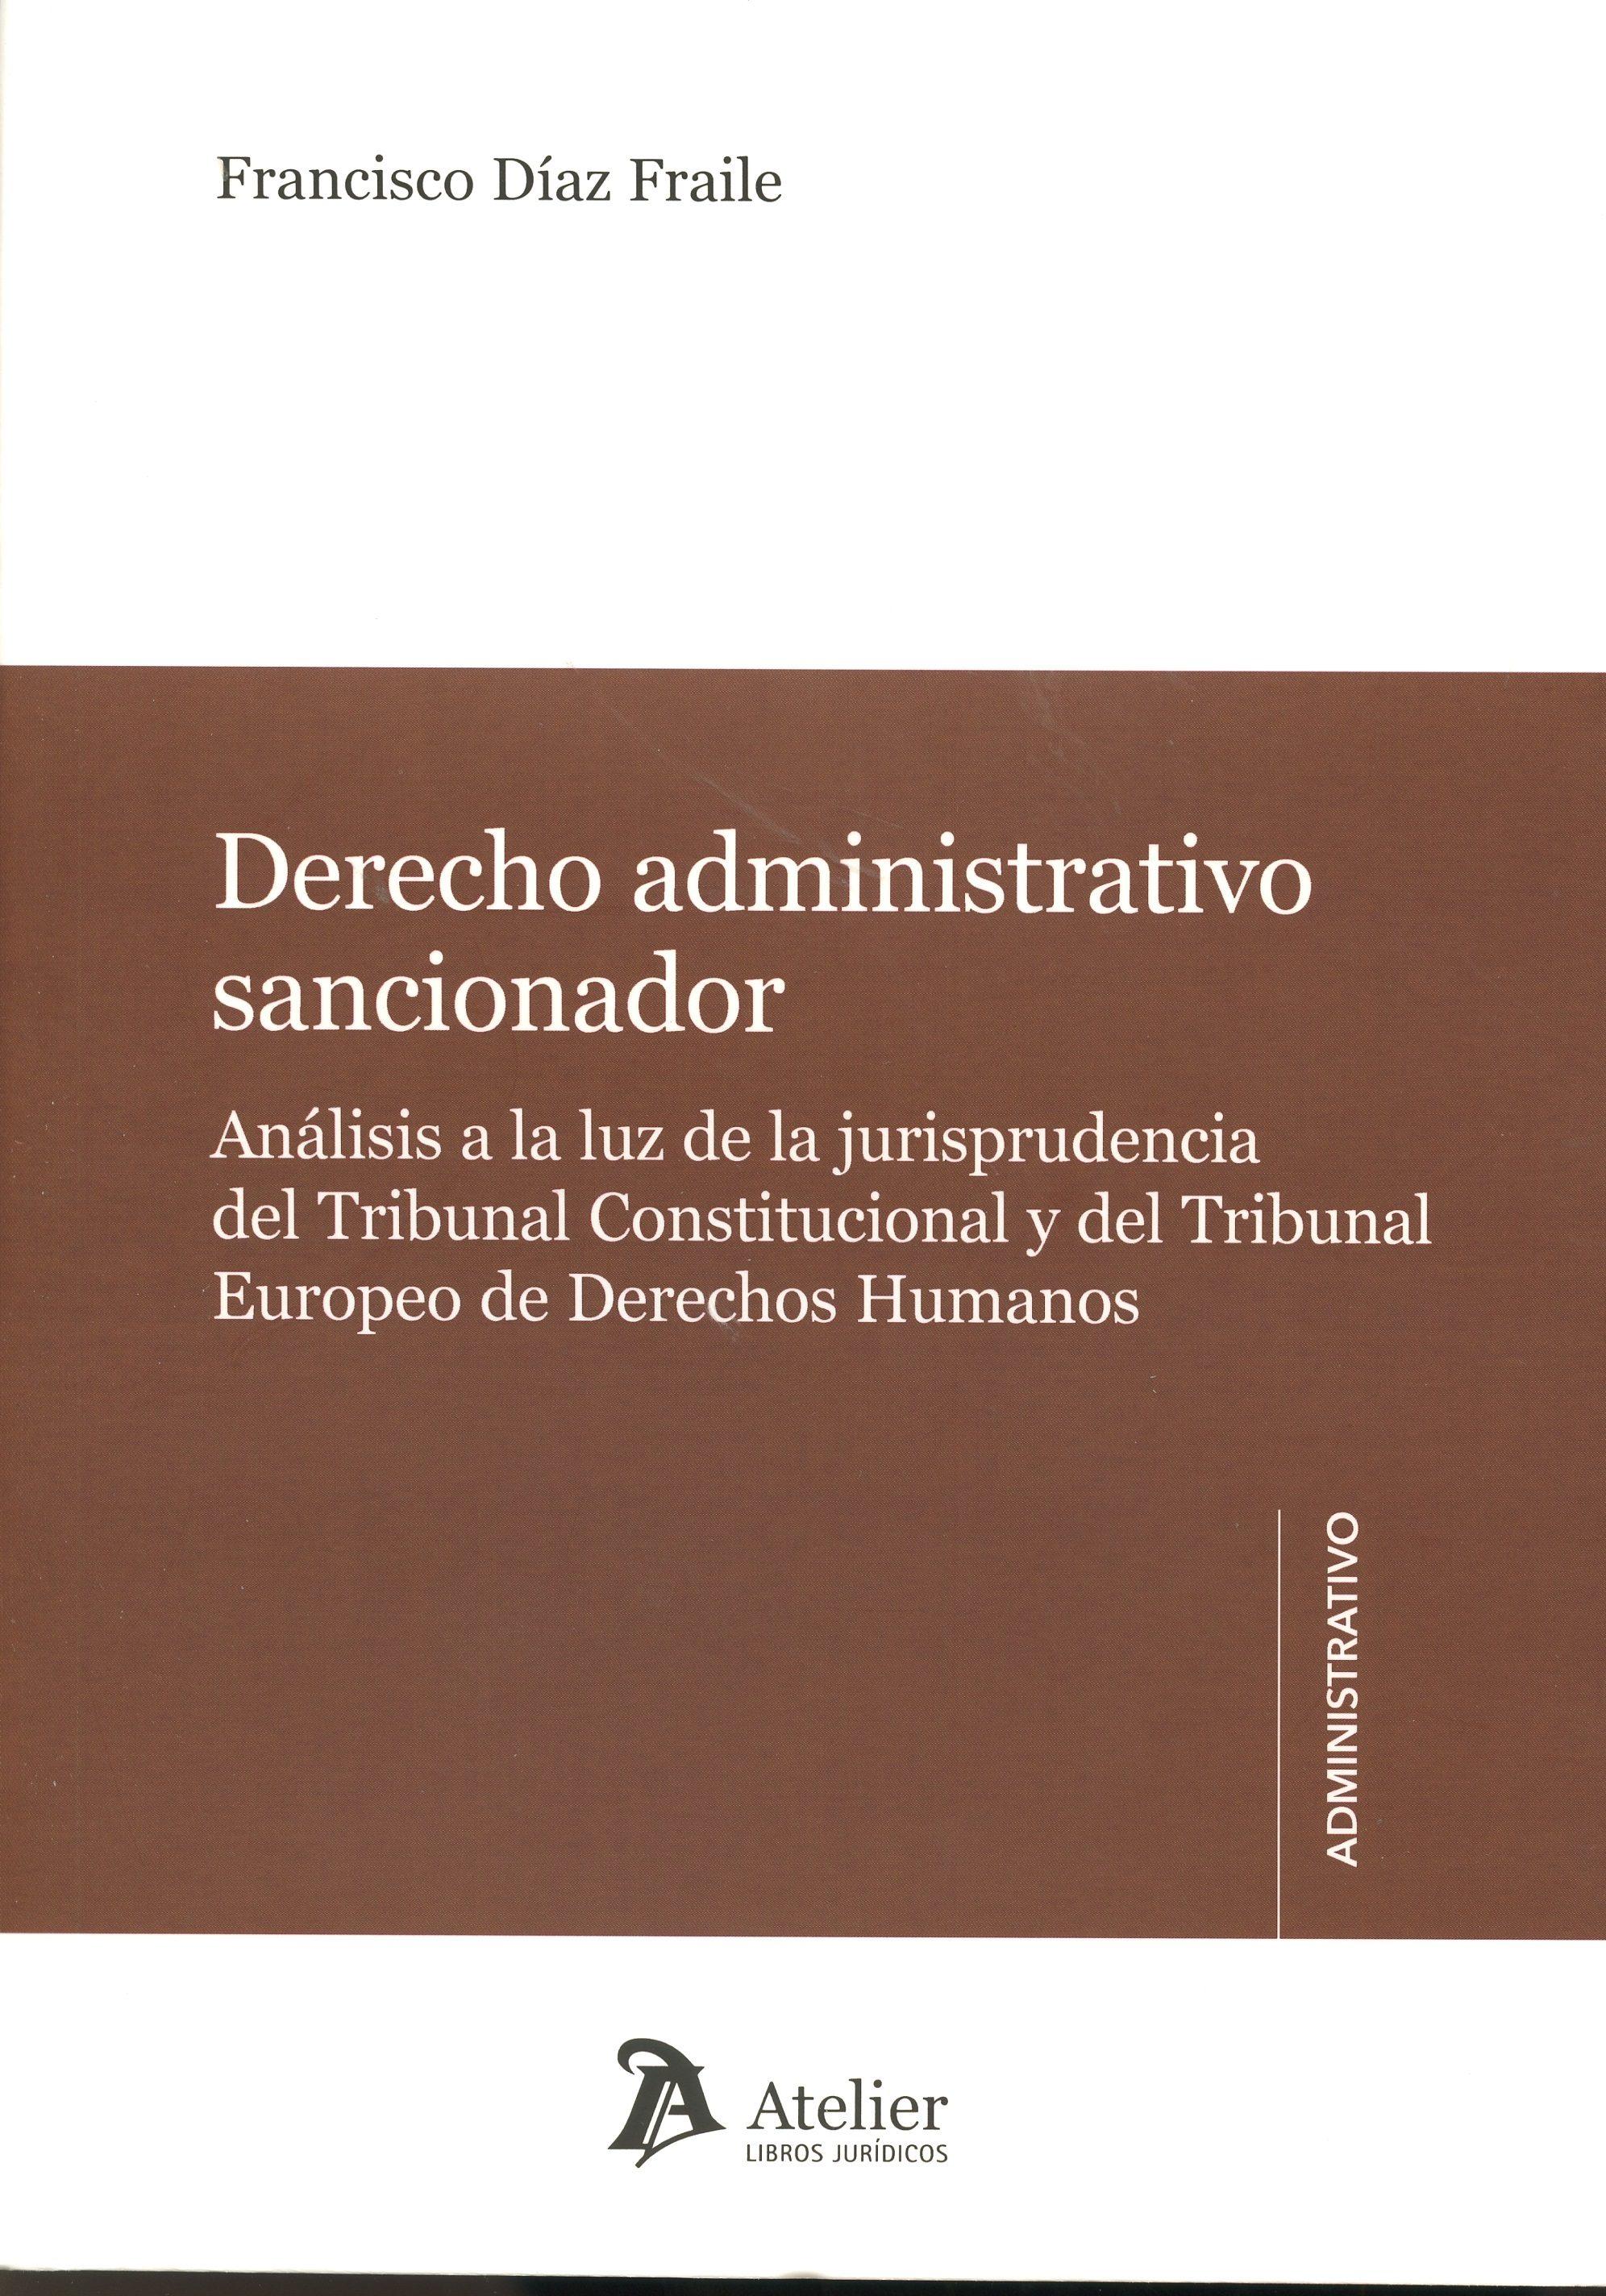 derecho administrativo sancionador-francisco díaz fraile-9788416652105